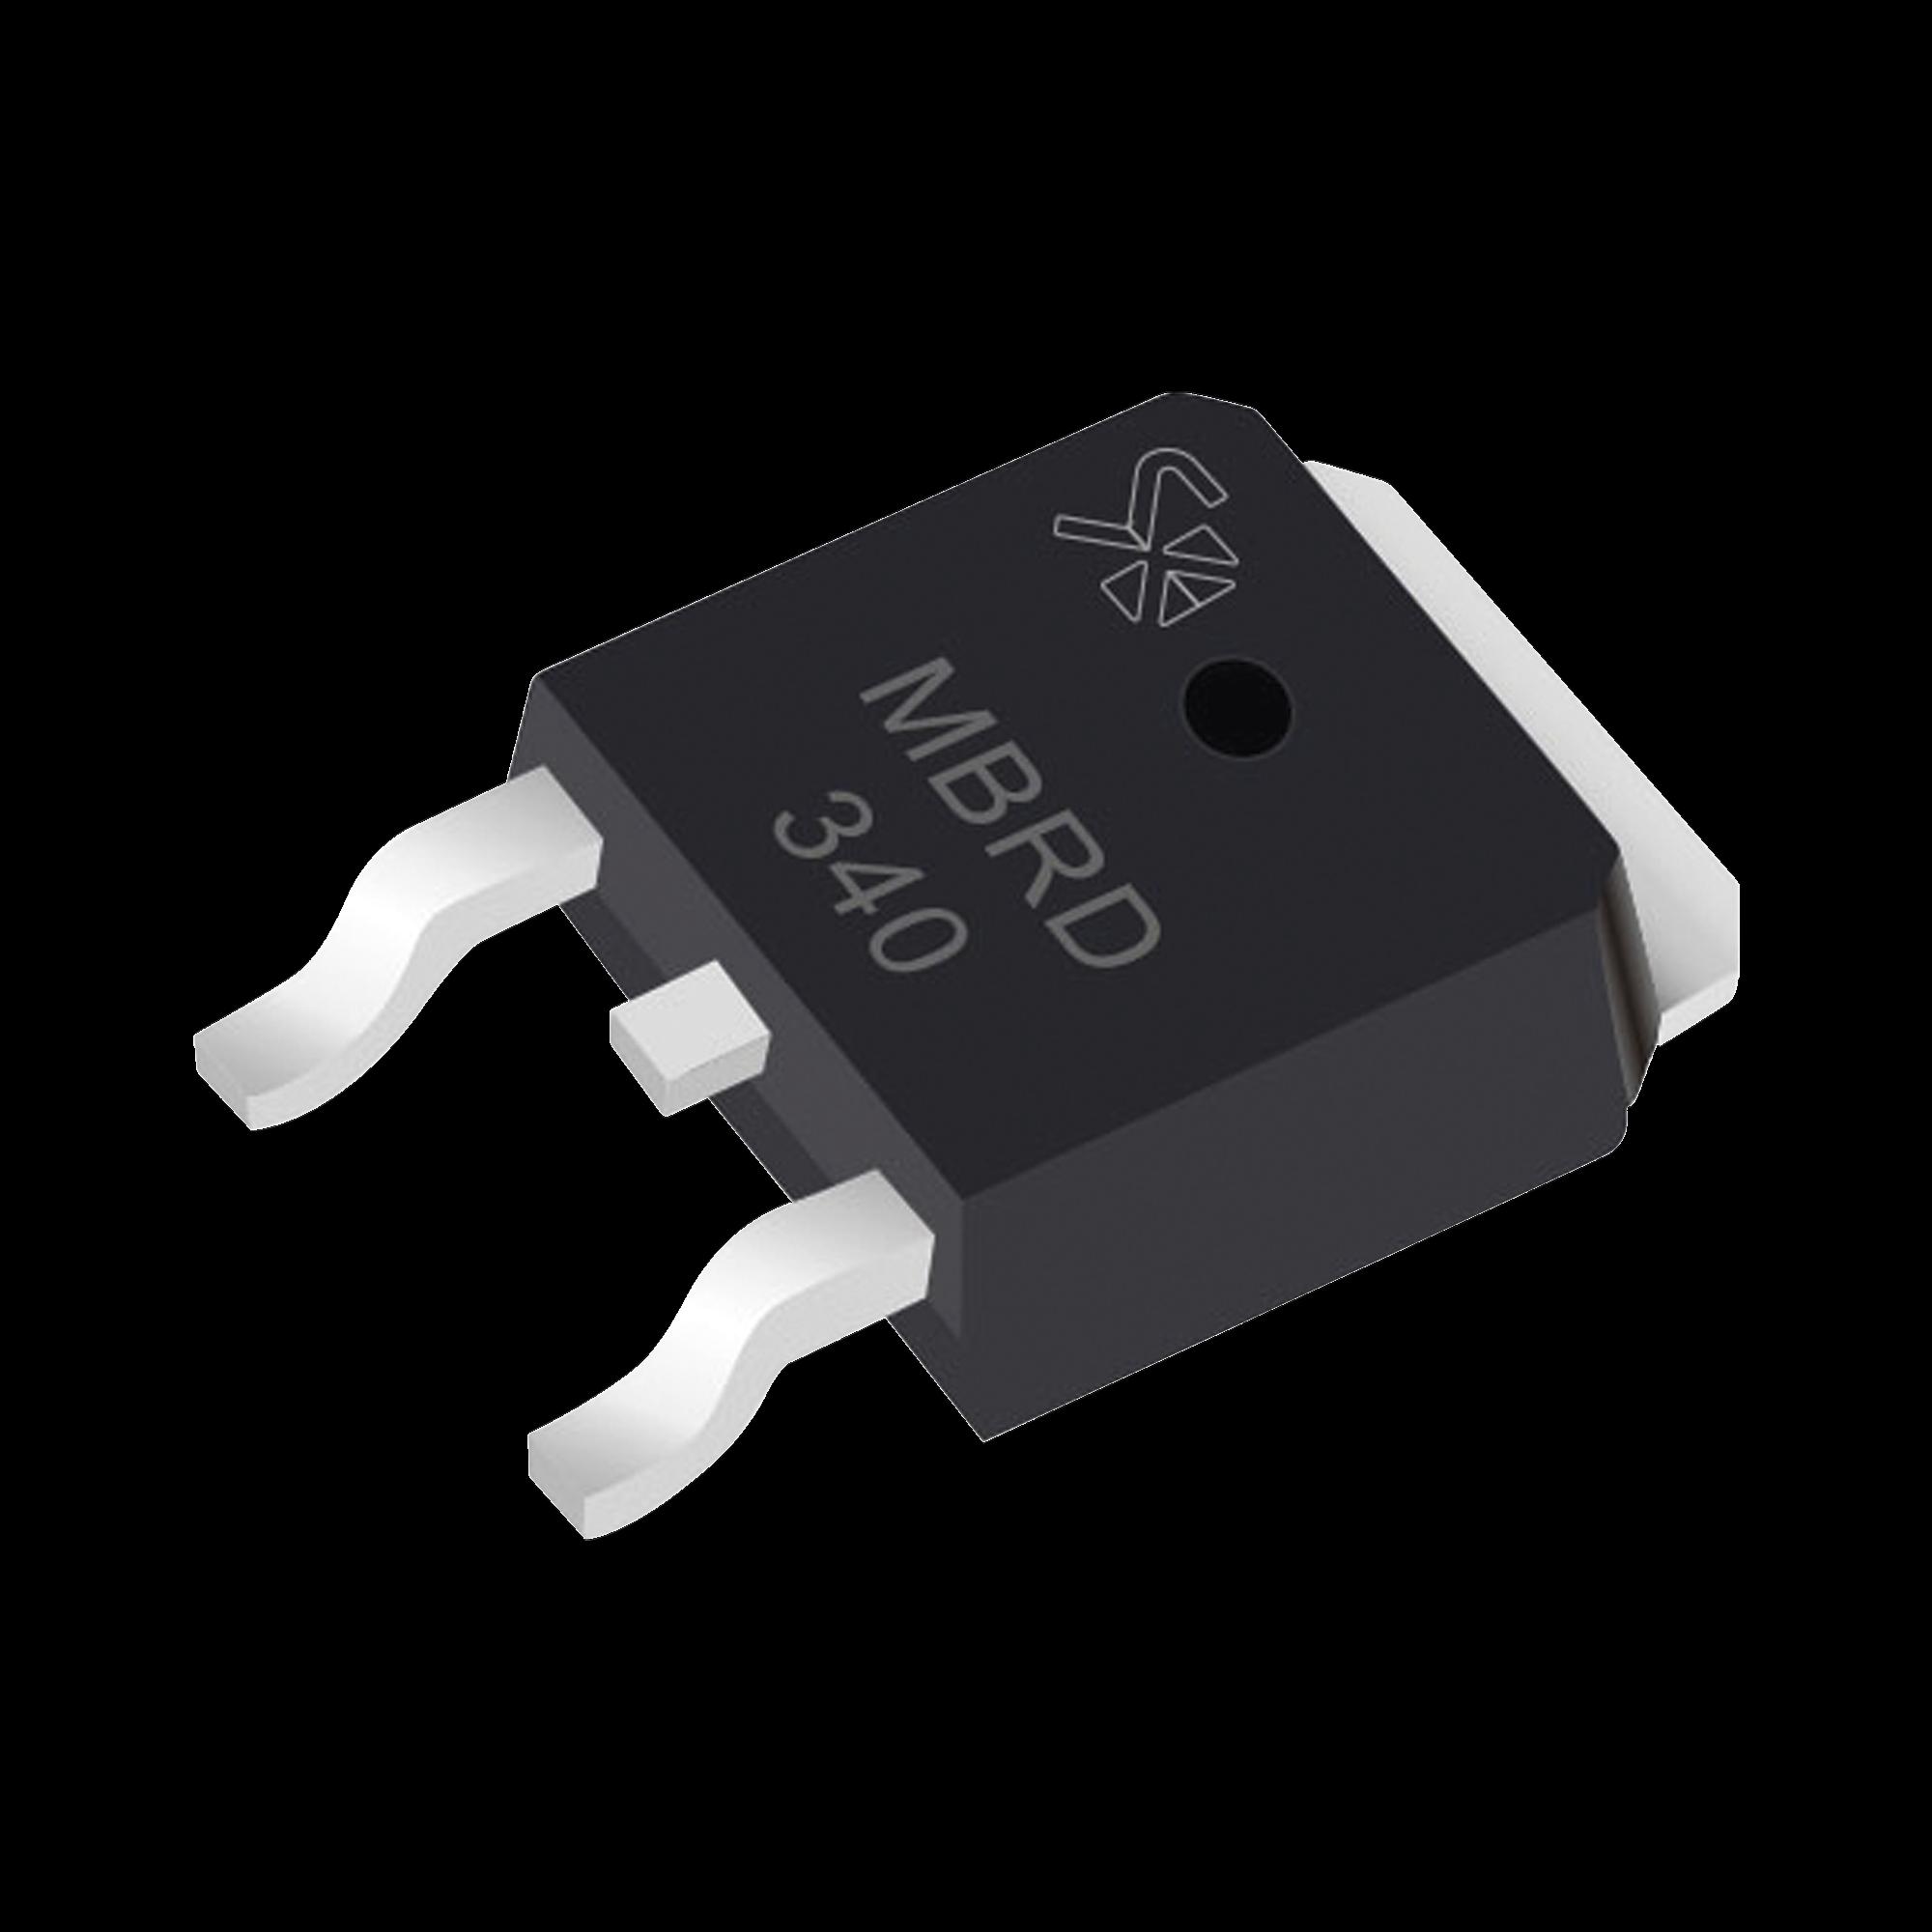 Diodo Rectificador Schottky, 3 Amp., 40 PIV, para SMD, Montaje DPAK, Tipo Anodo Dual.